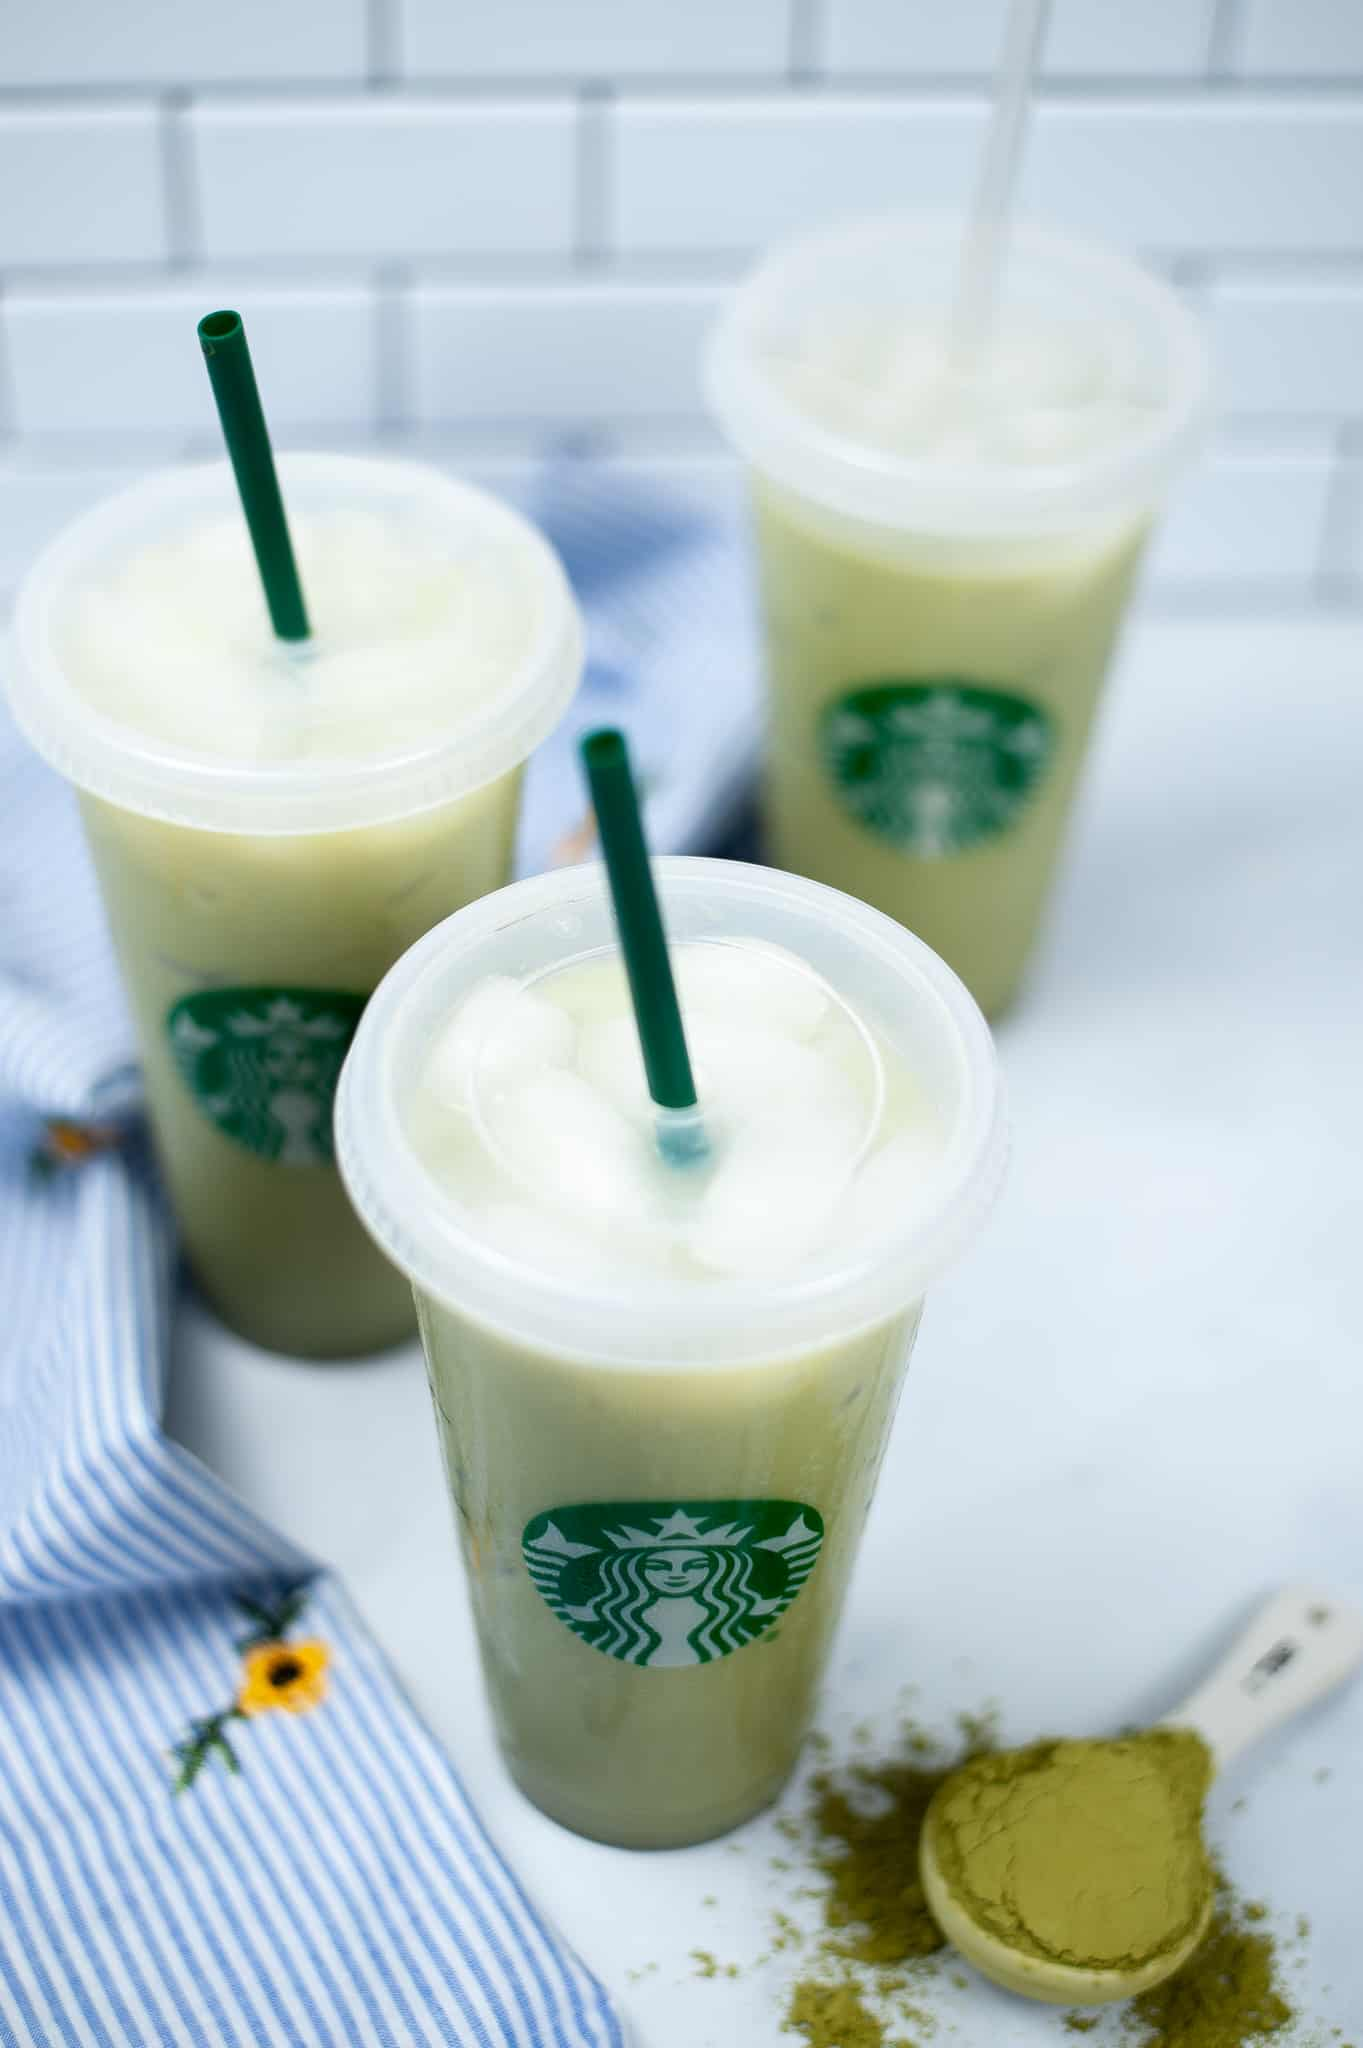 Top shot of 3 matcha lattes with green straws.